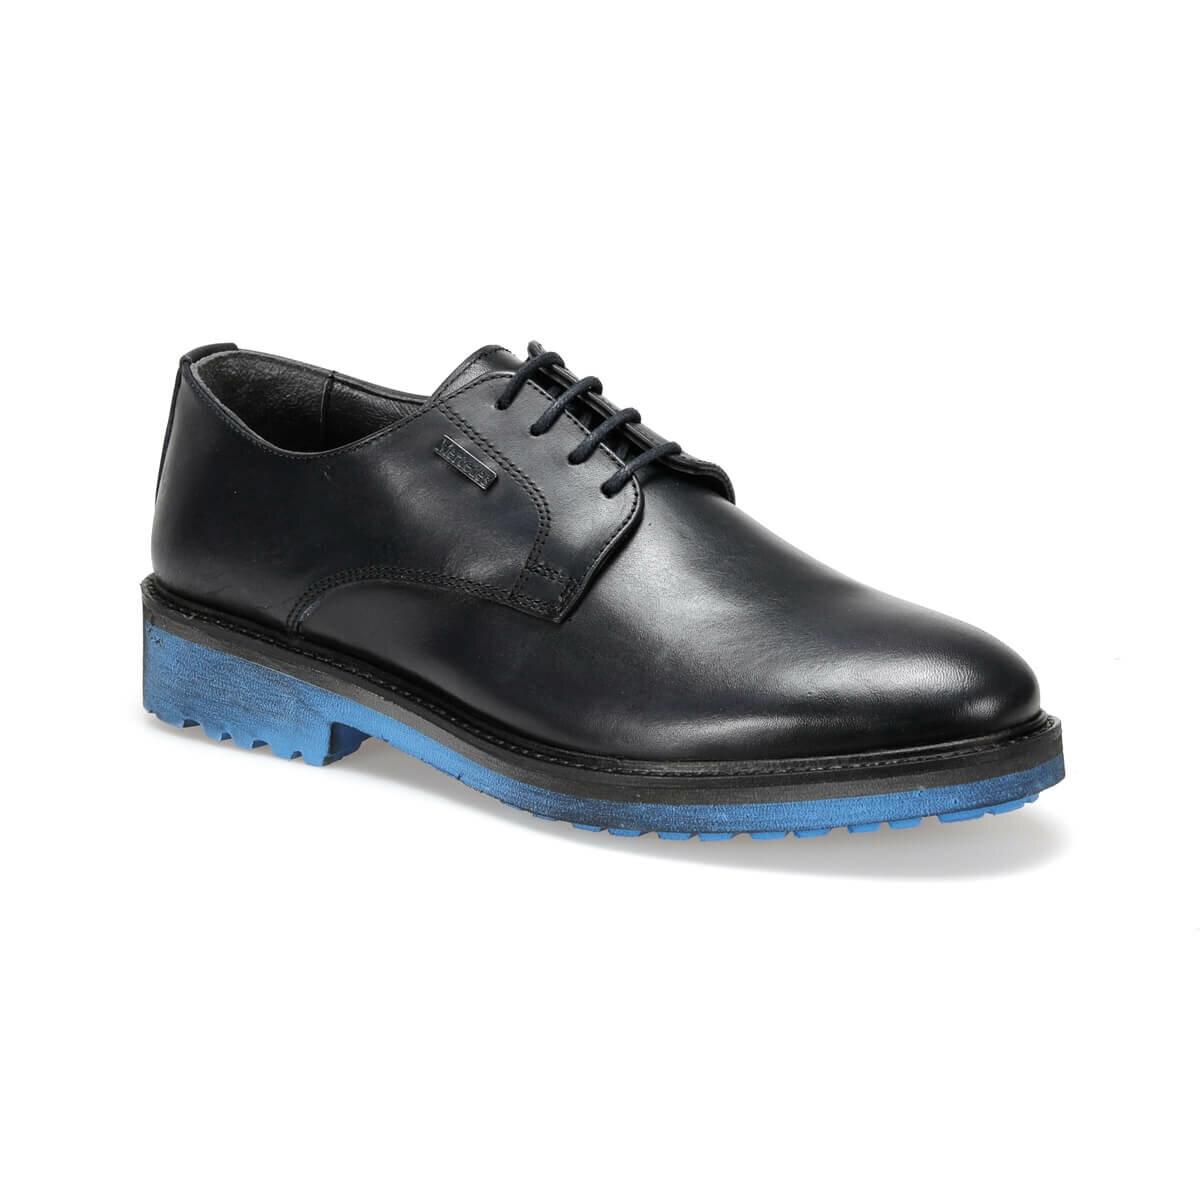 FLO LINA Navy Blue Men 'S Classic Shoes MERCEDES